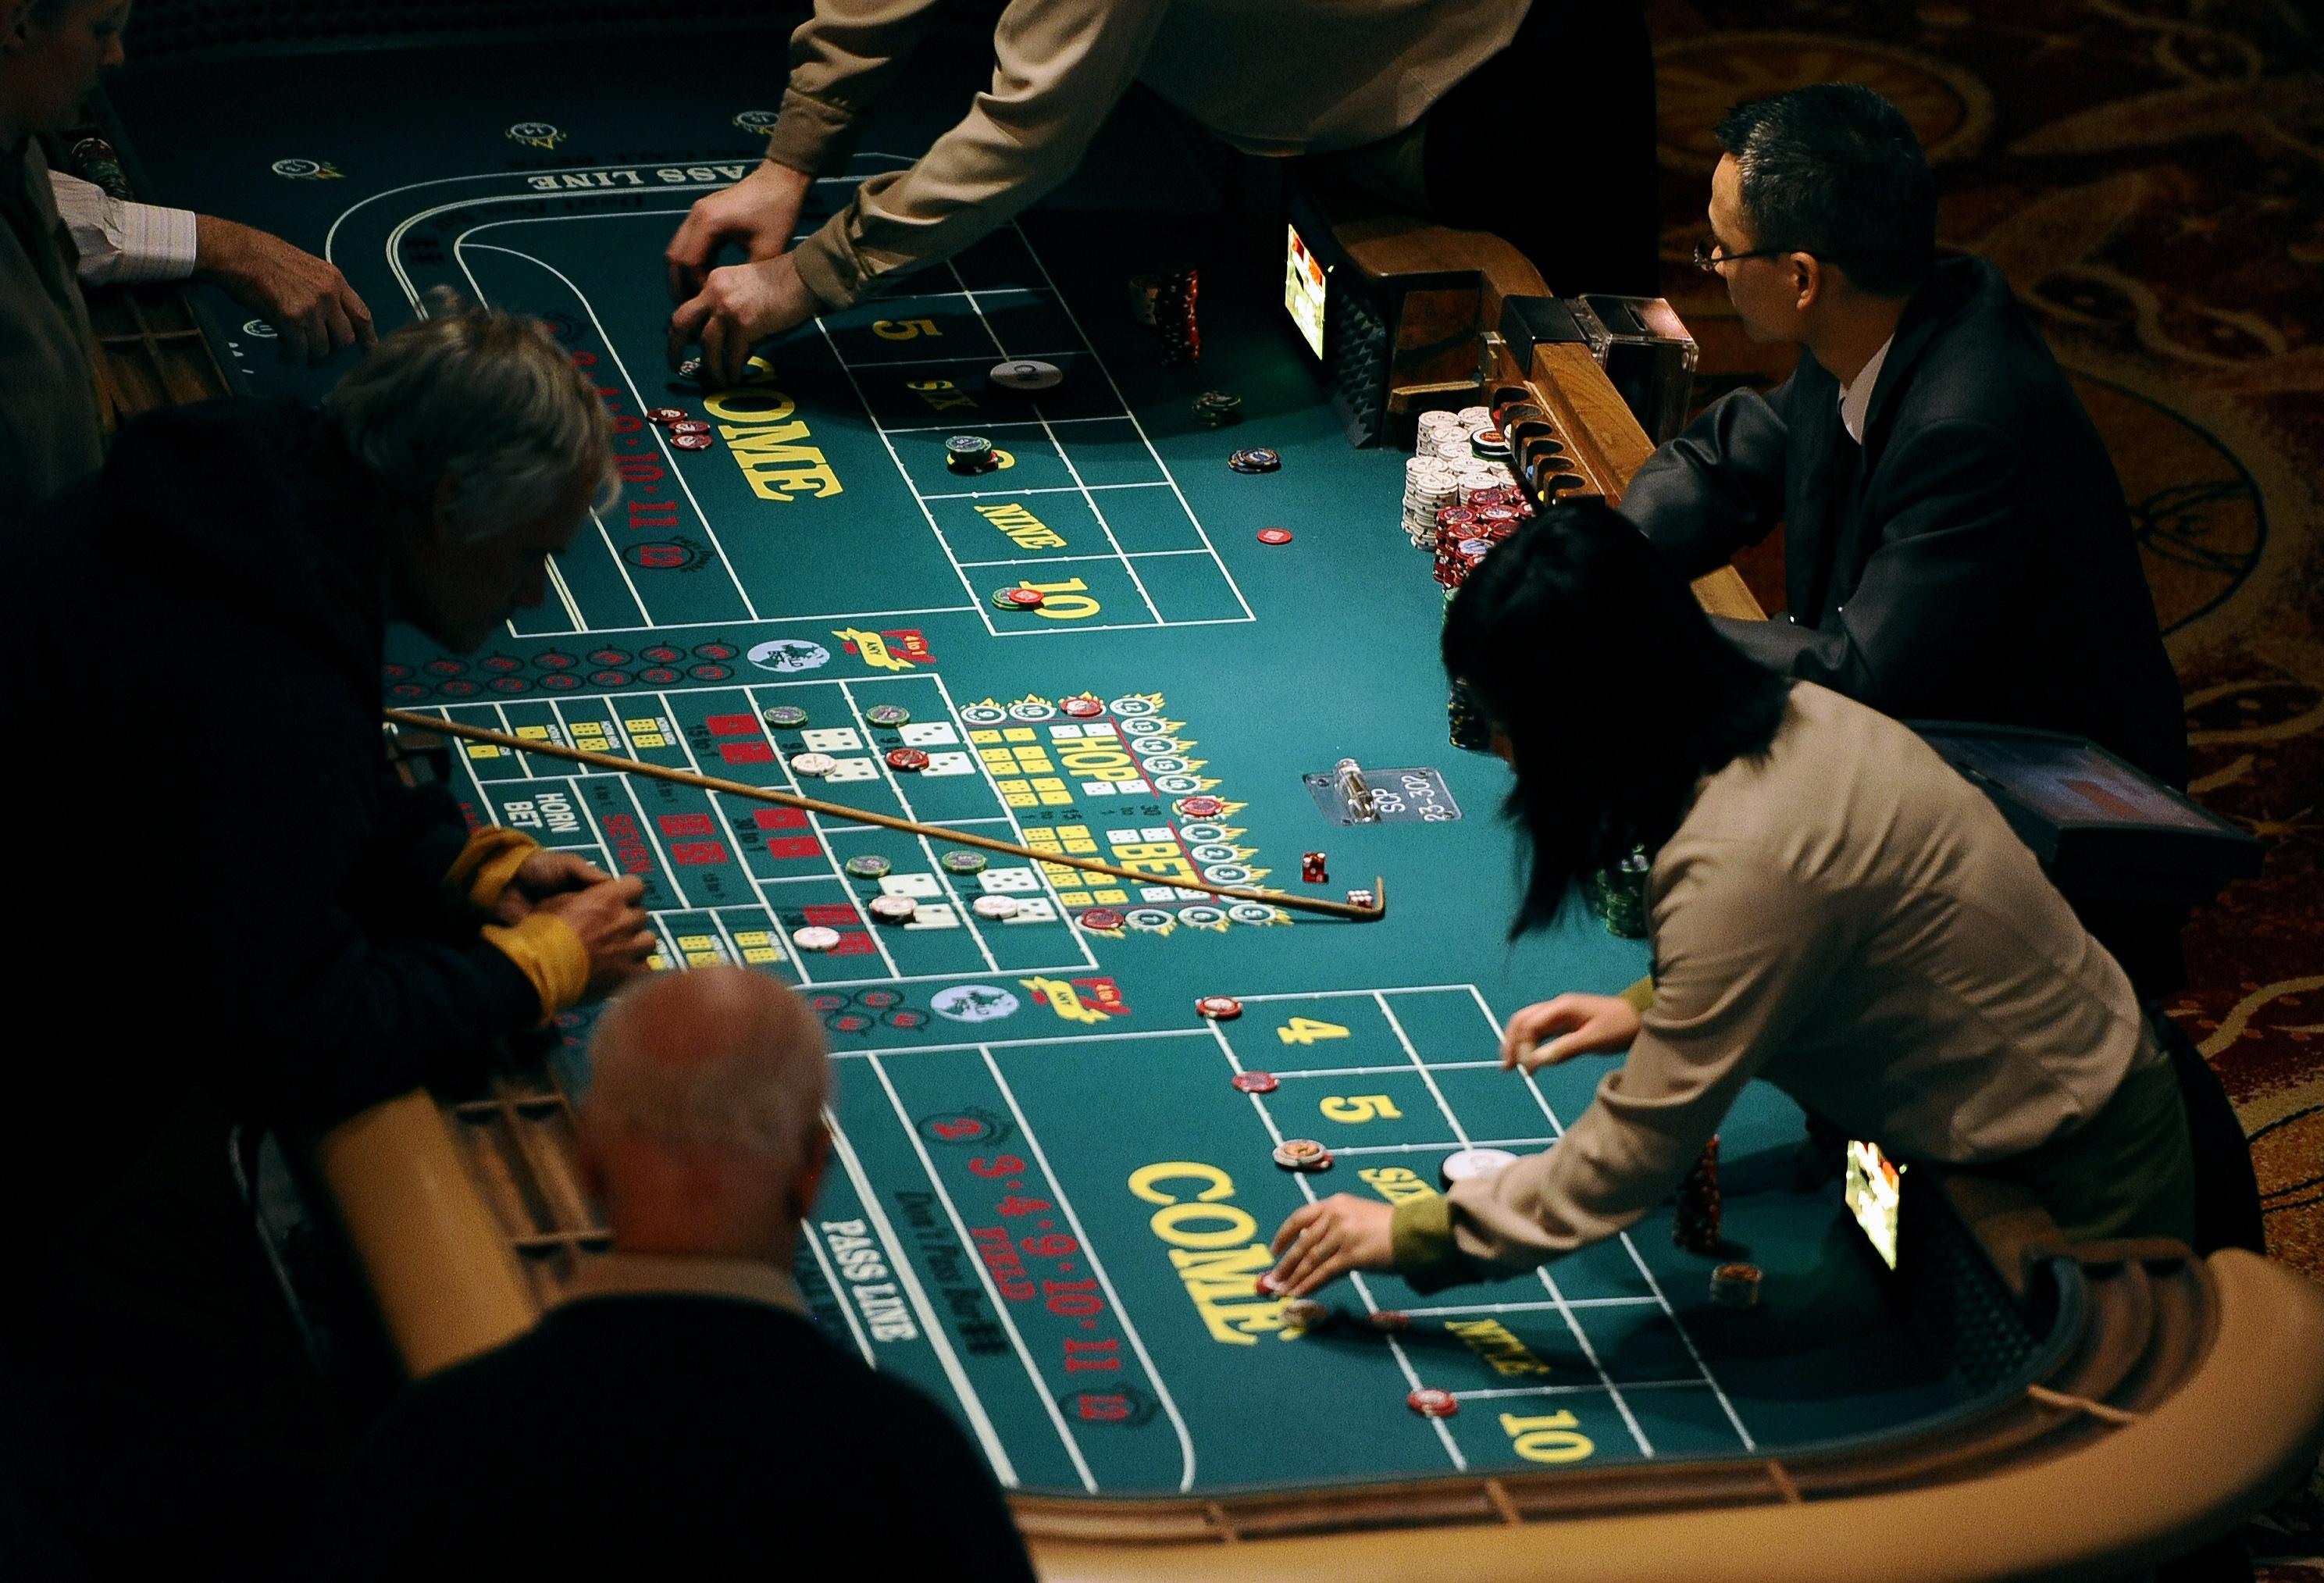 La quinta catalina casino